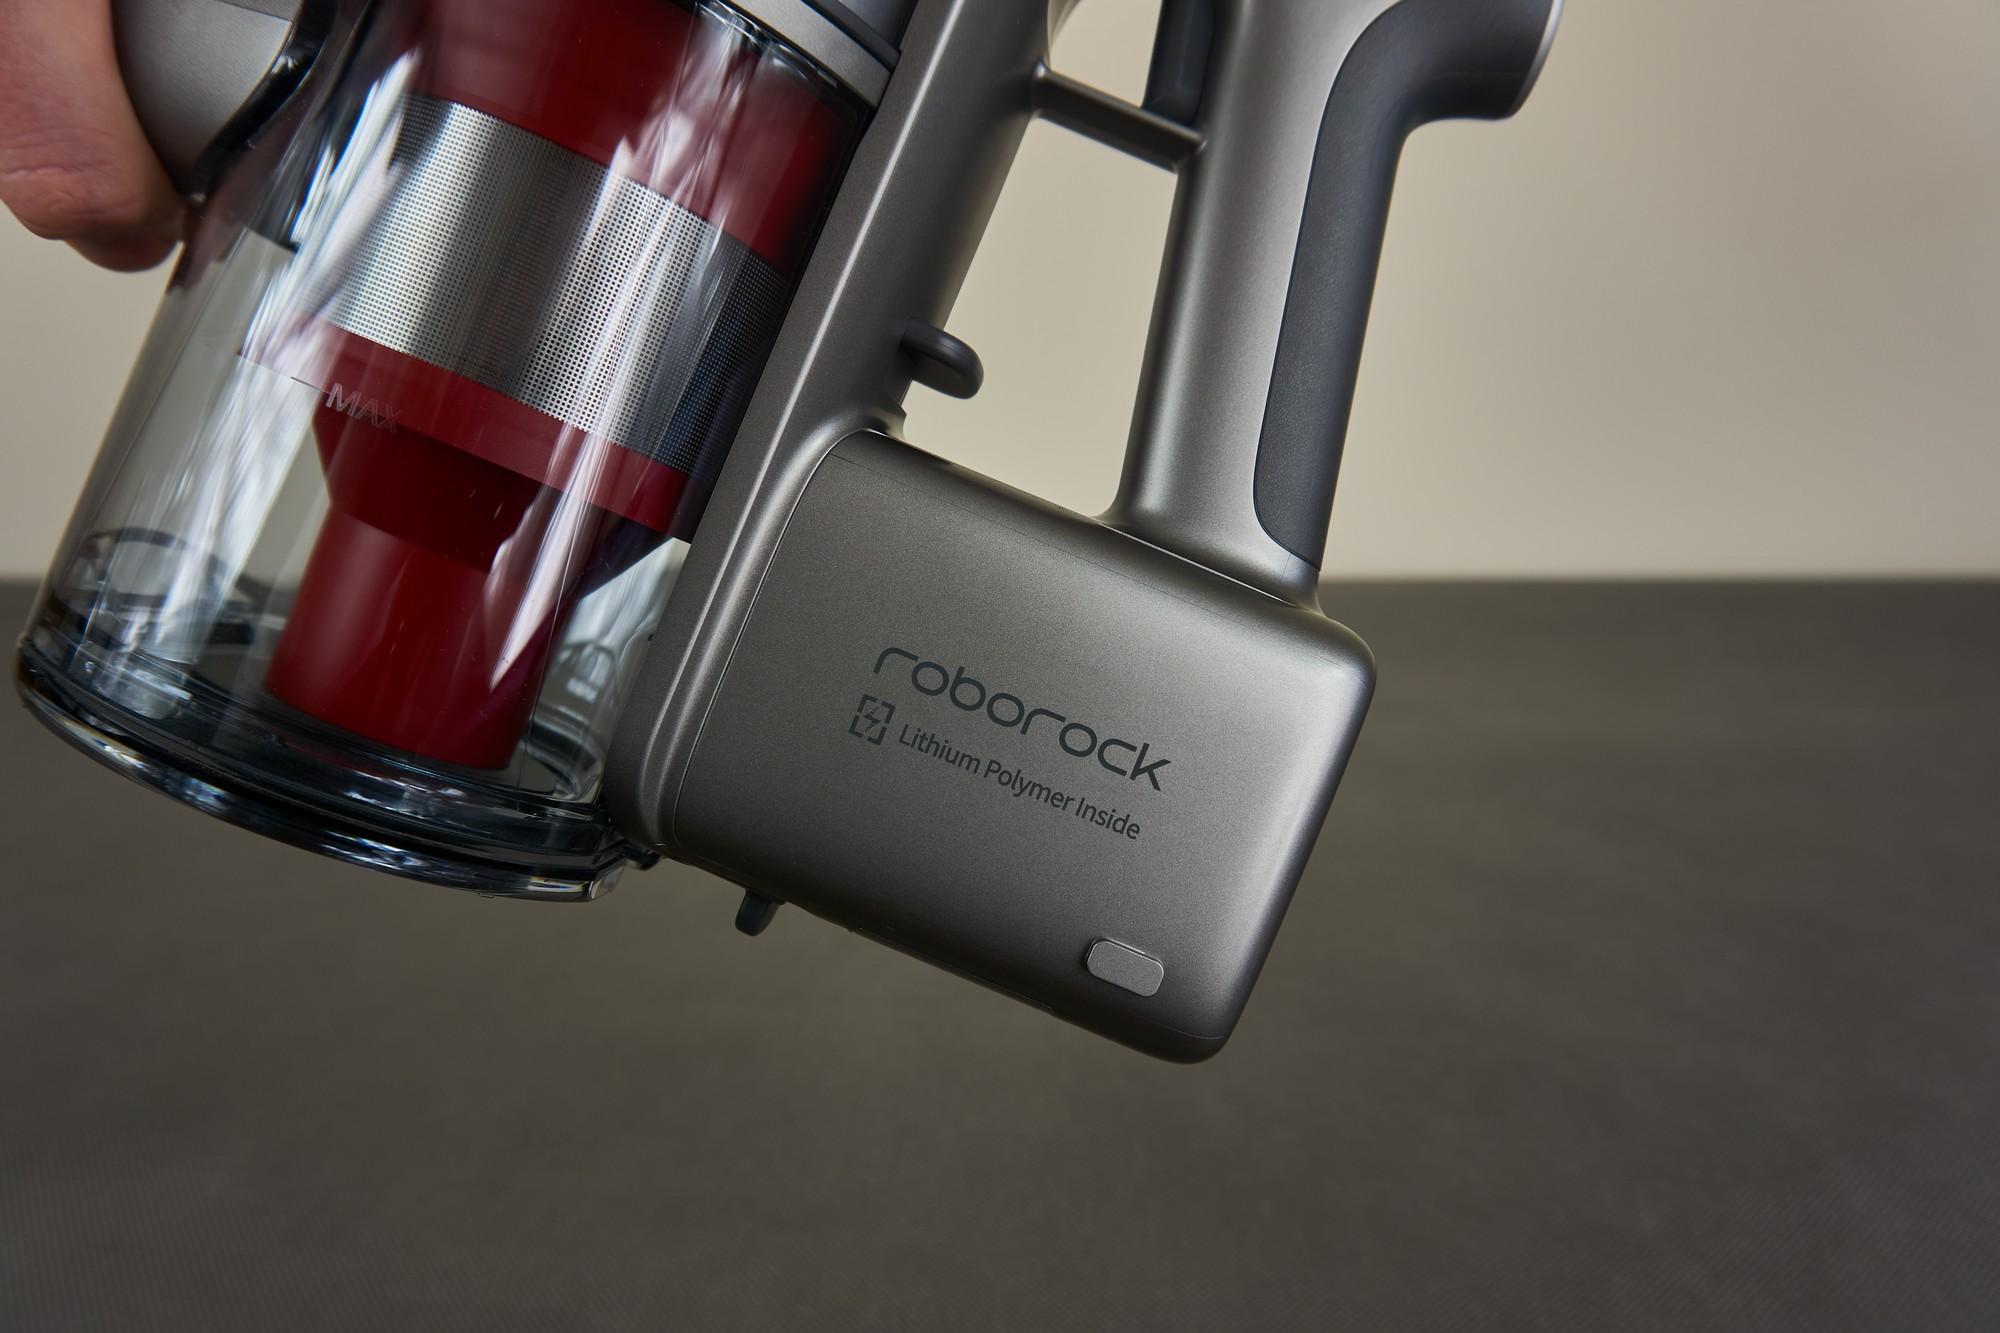 Roborock H7